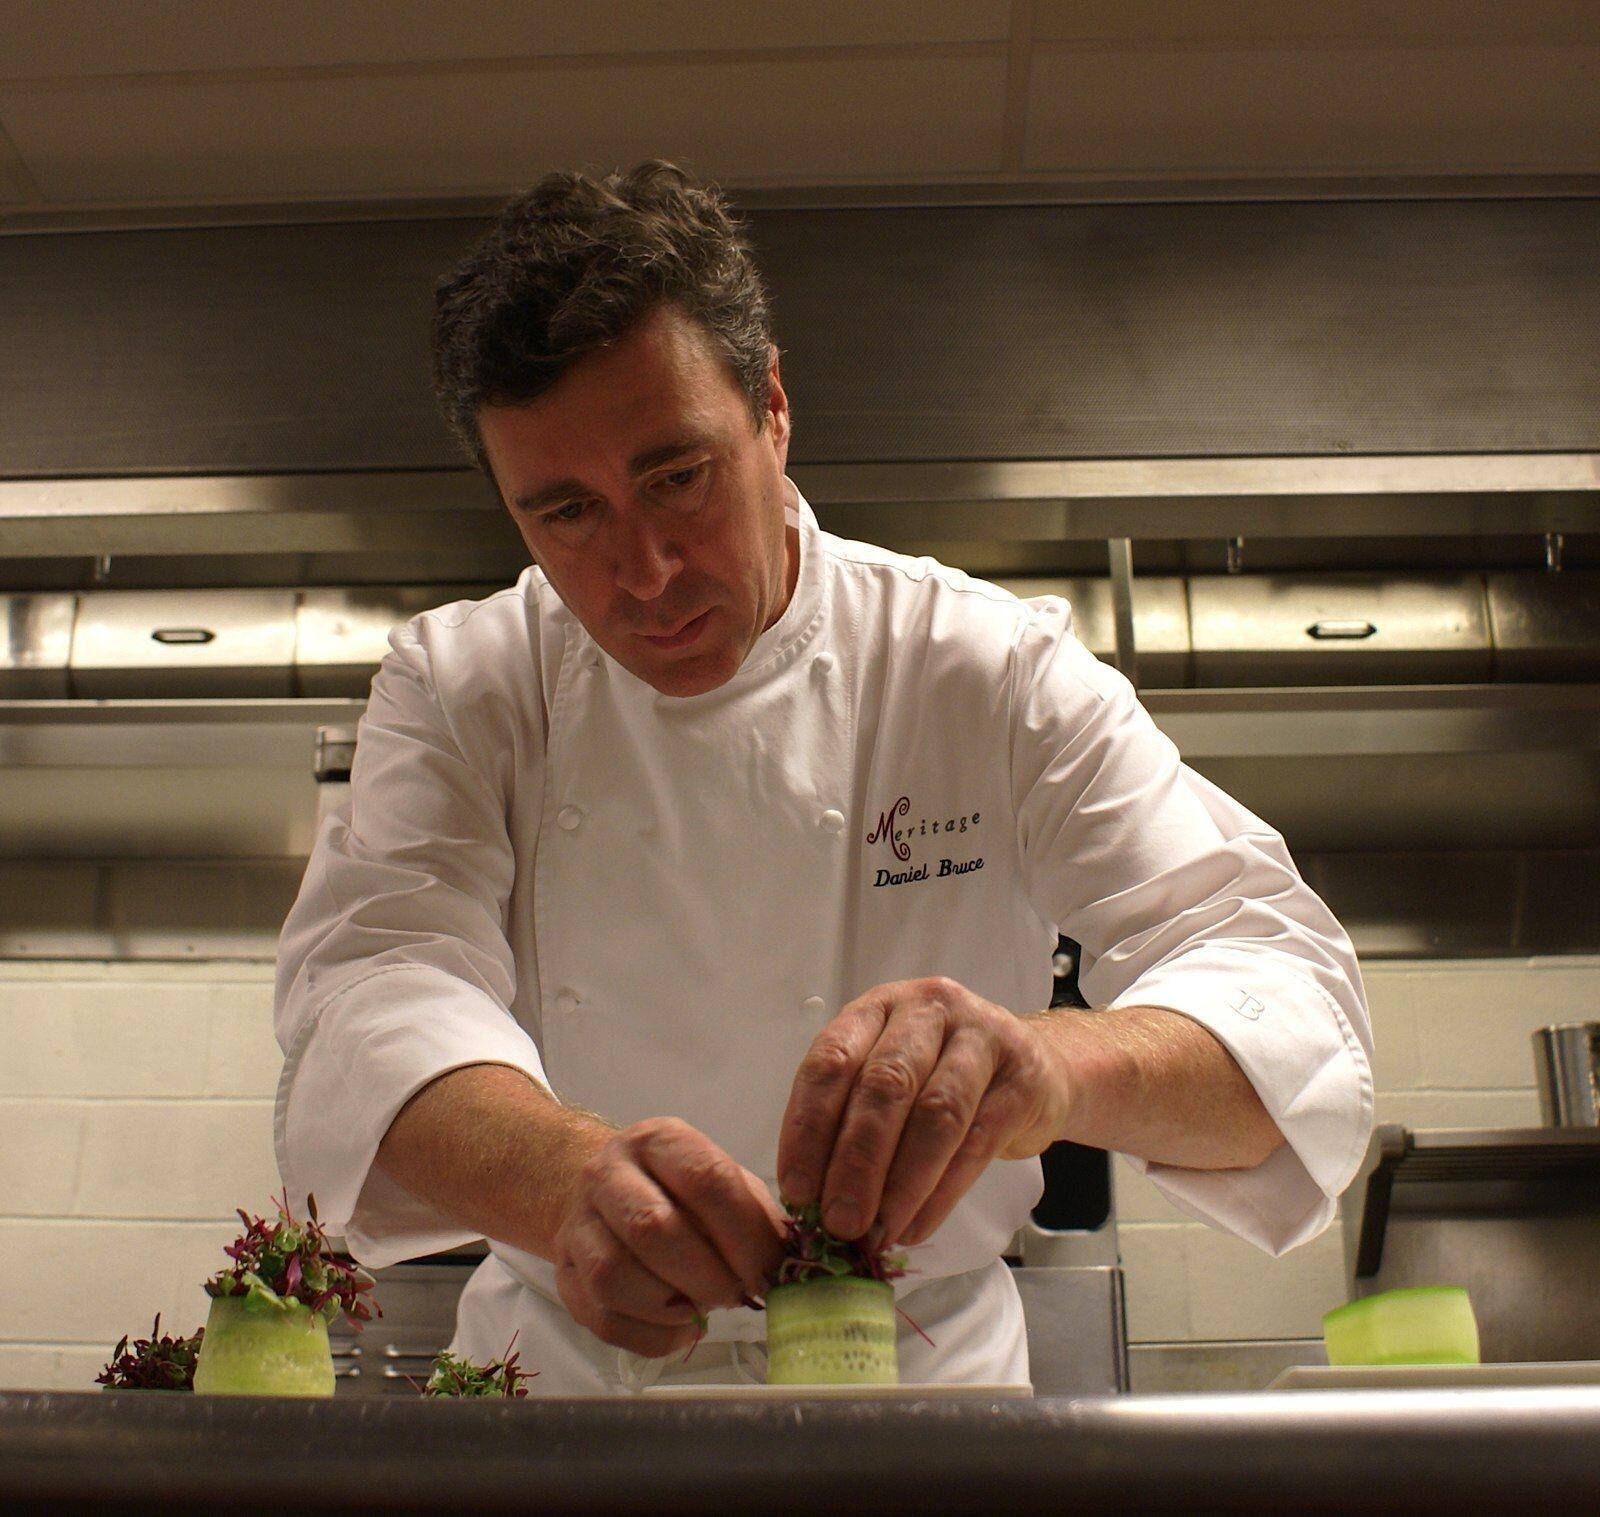 Chef Daniel Bruce prepping a dish